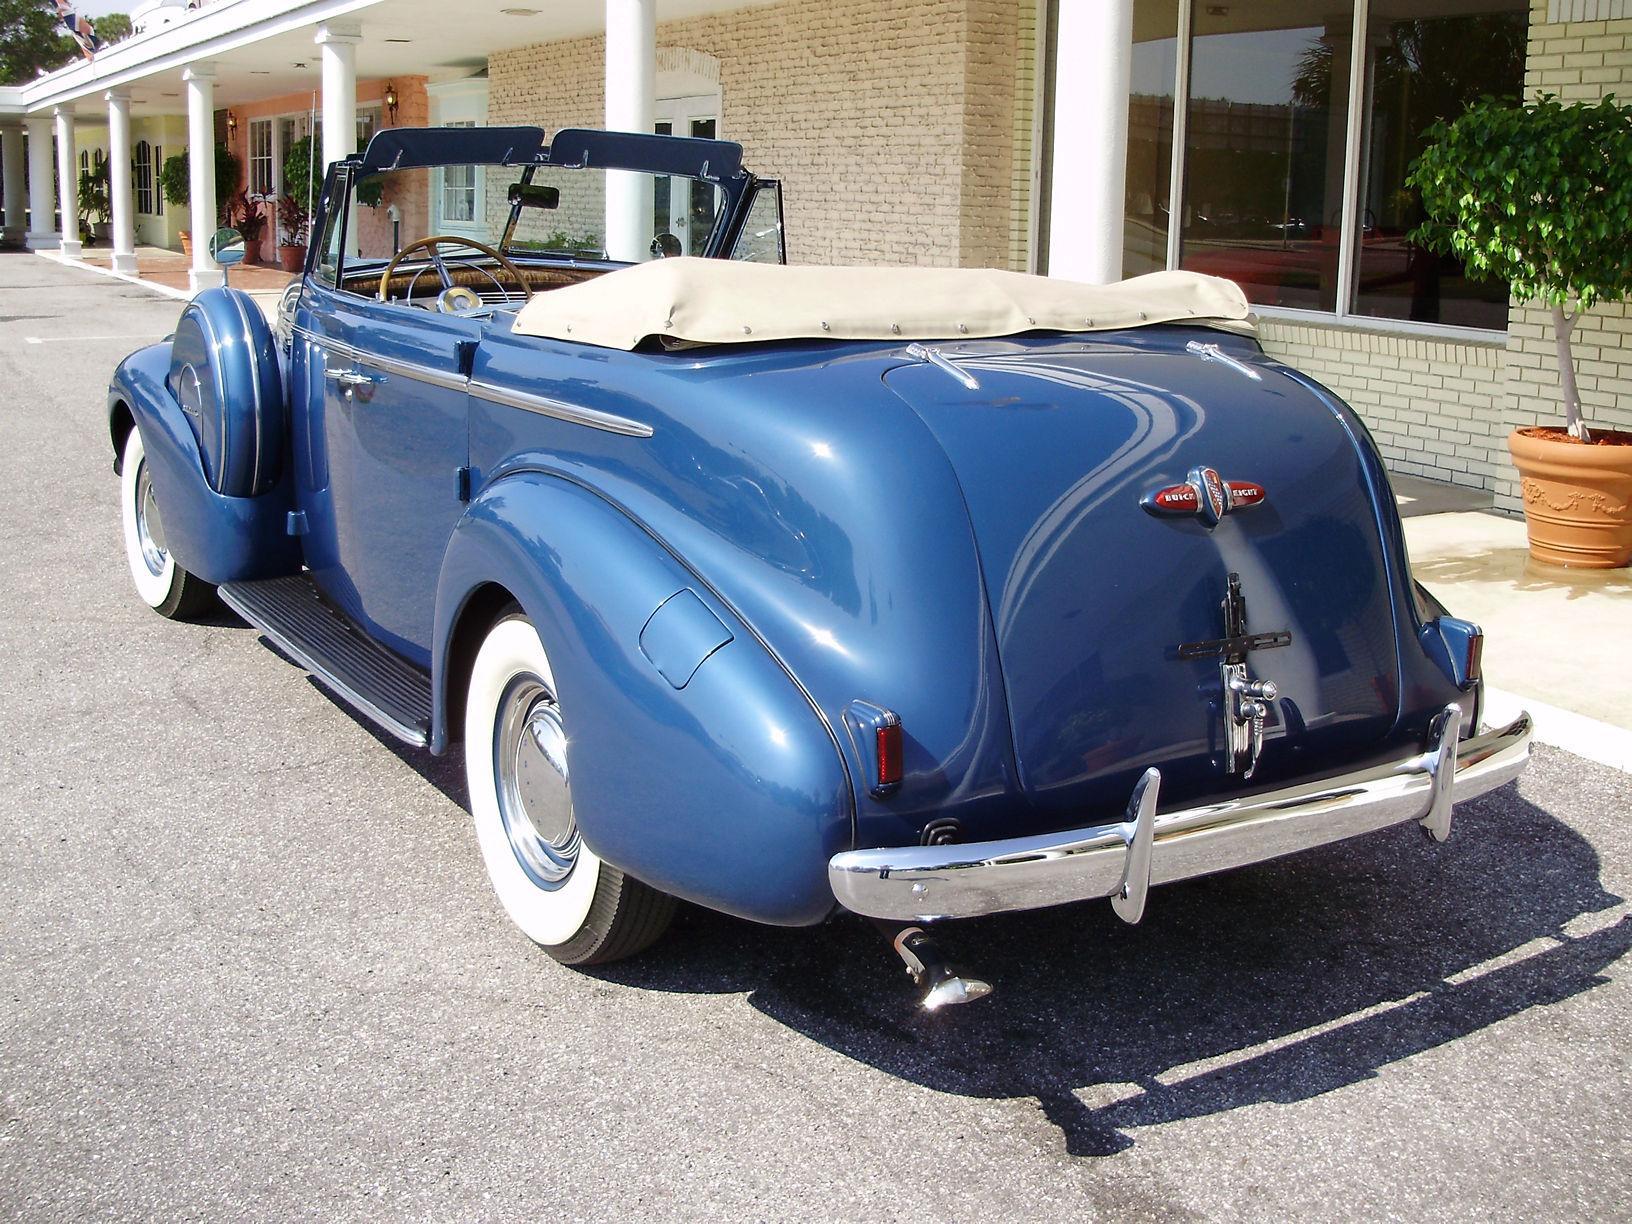 1940 BUICK CENTURY CONVERTIBLE SEDAN - Vintage Motors of Sarasota Inc. #5